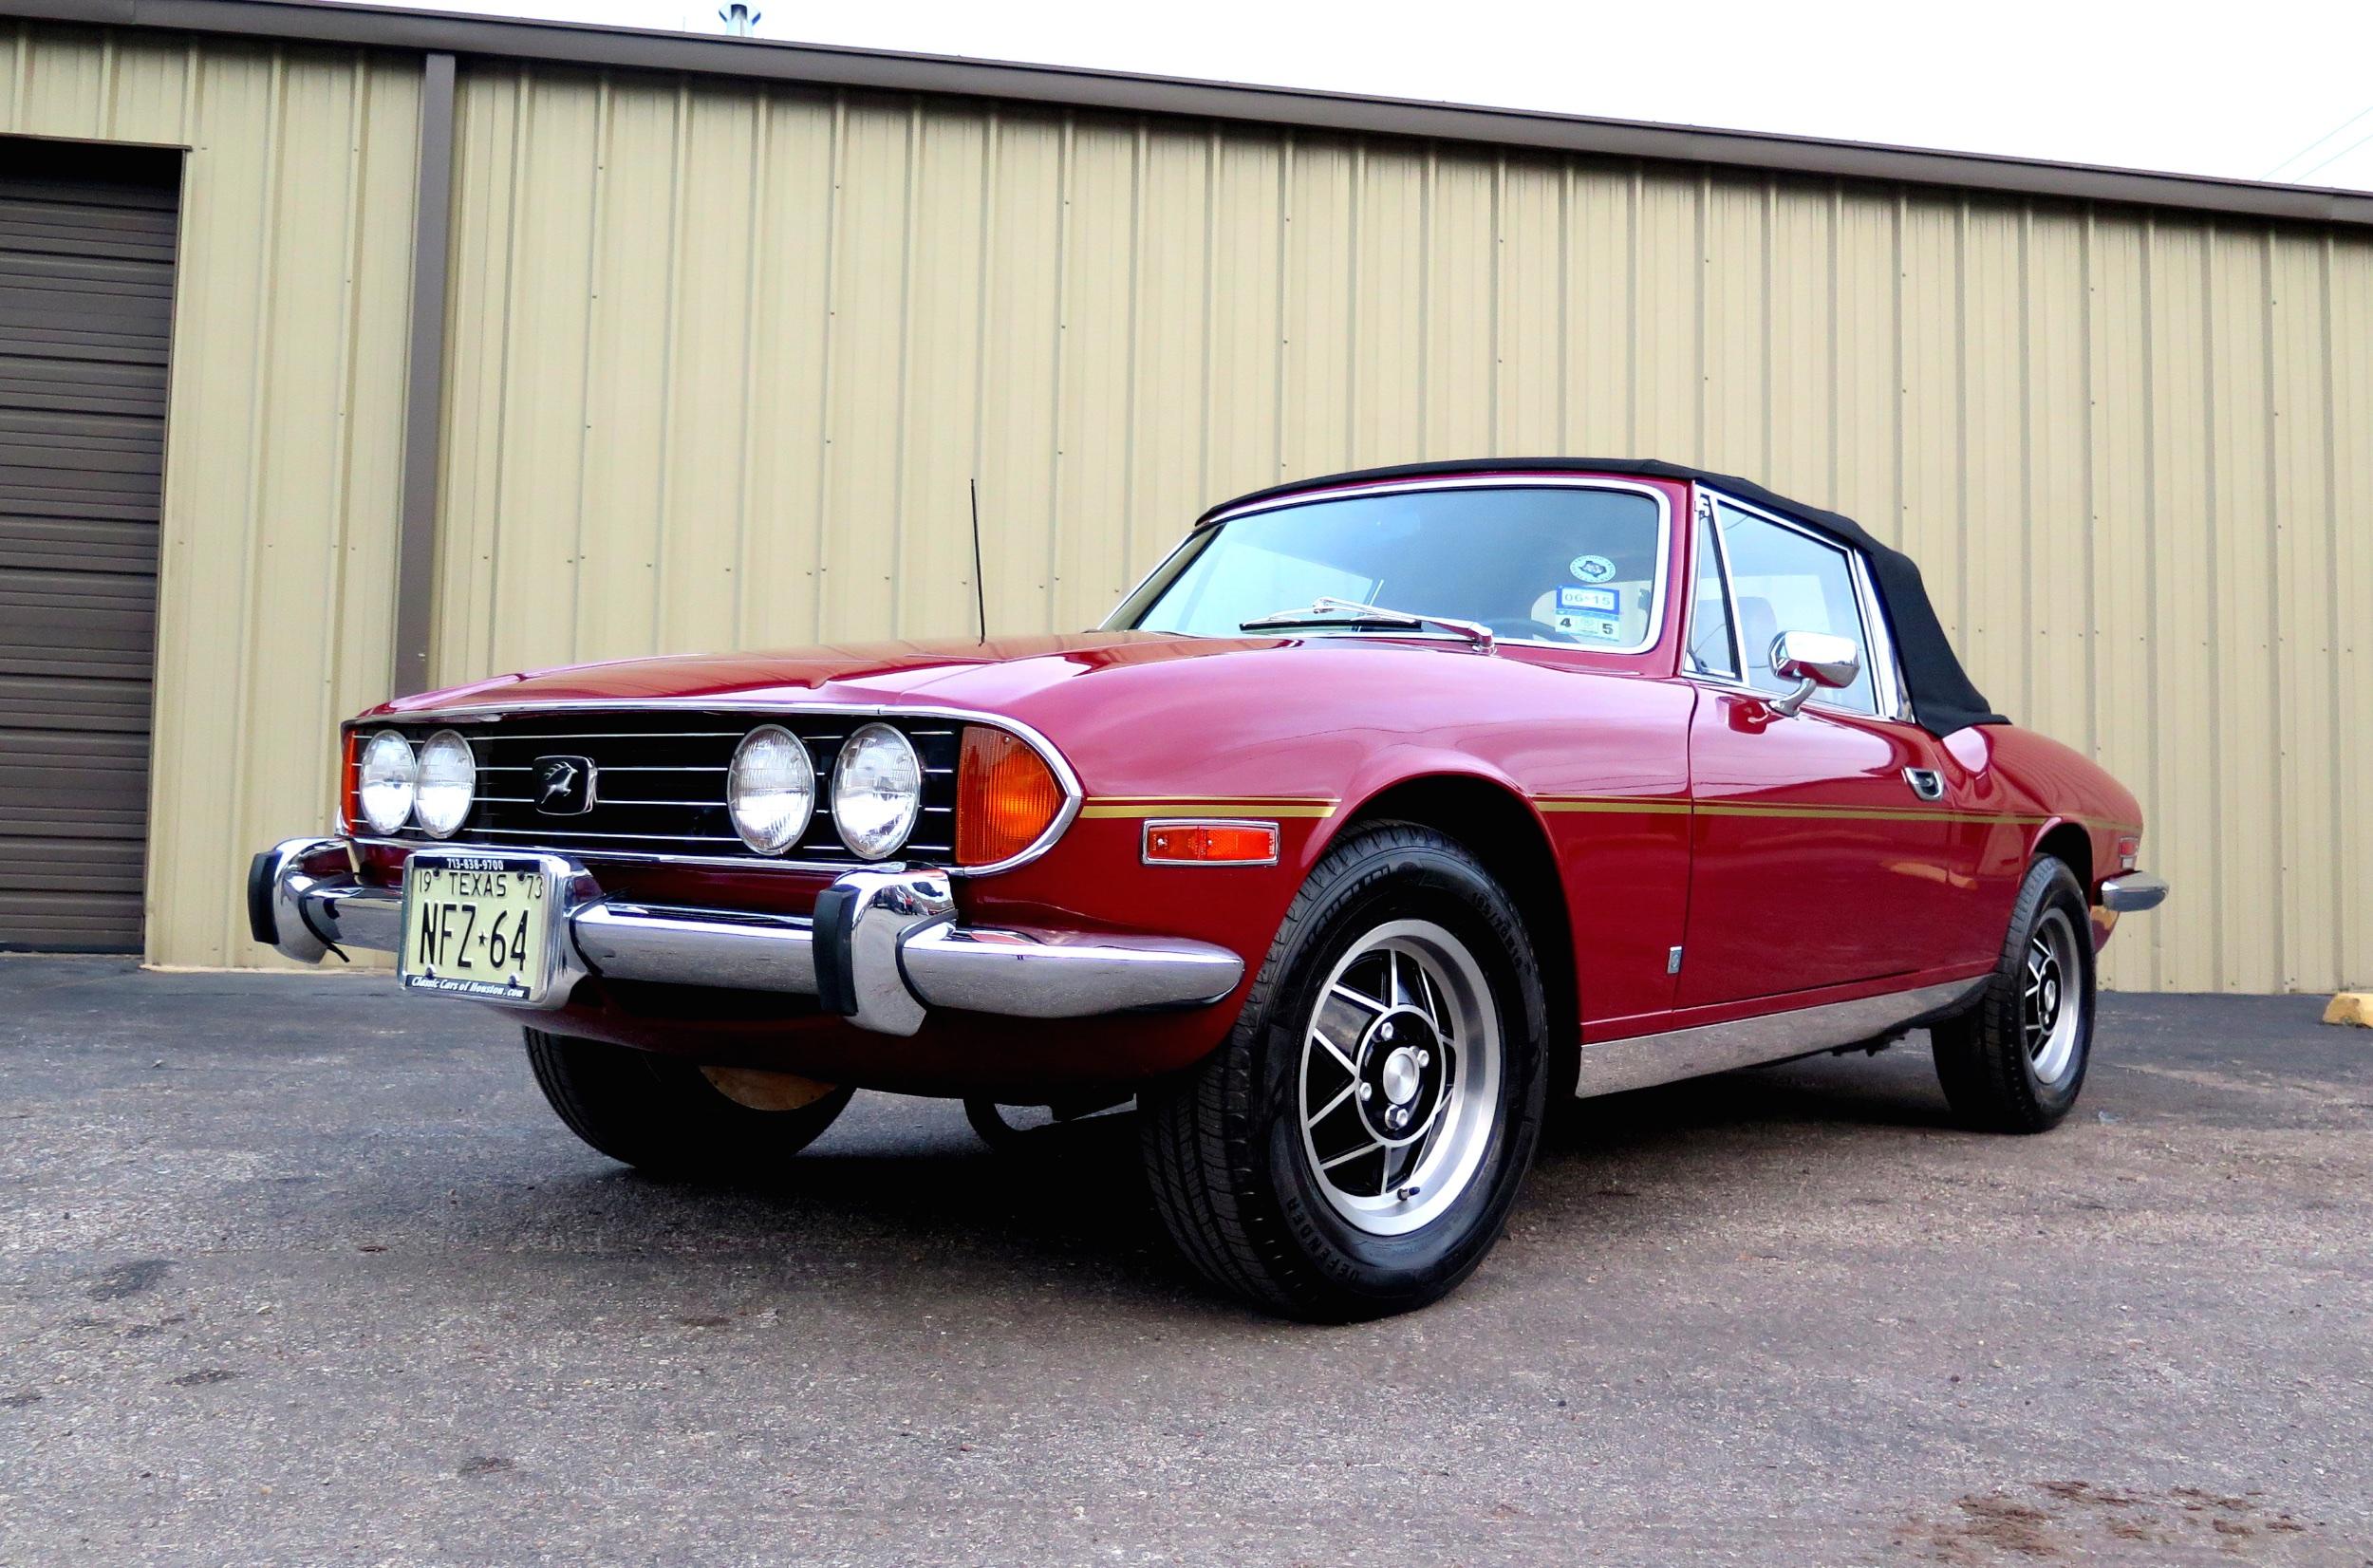 001_1973_Triumph_Stag-IMG_4963.jpg